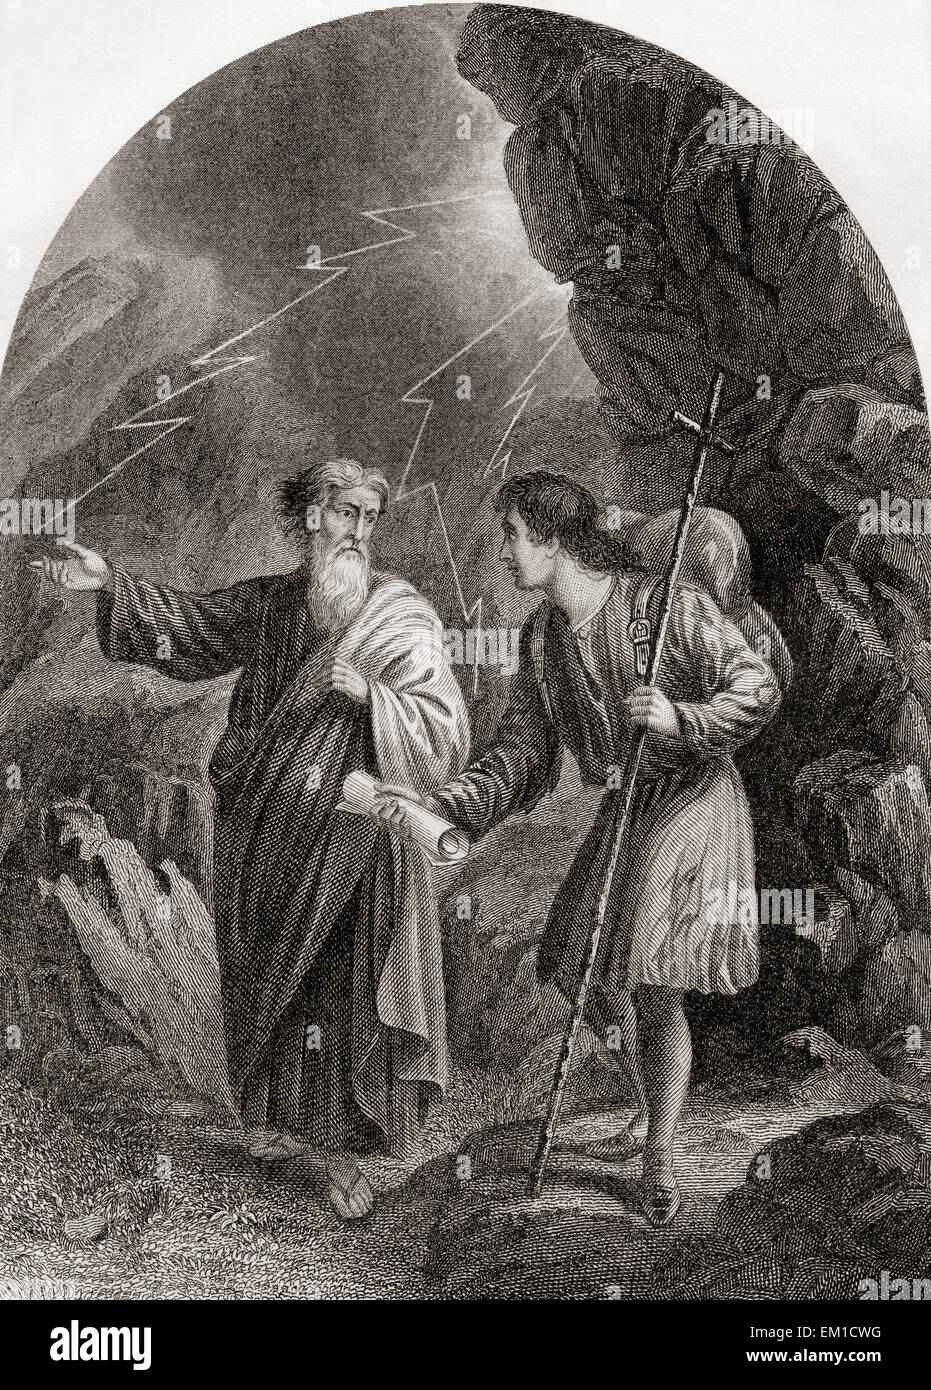 Christian and Evangelist.  From The Pilgrim's Progress by John Bunyan. - Stock Image